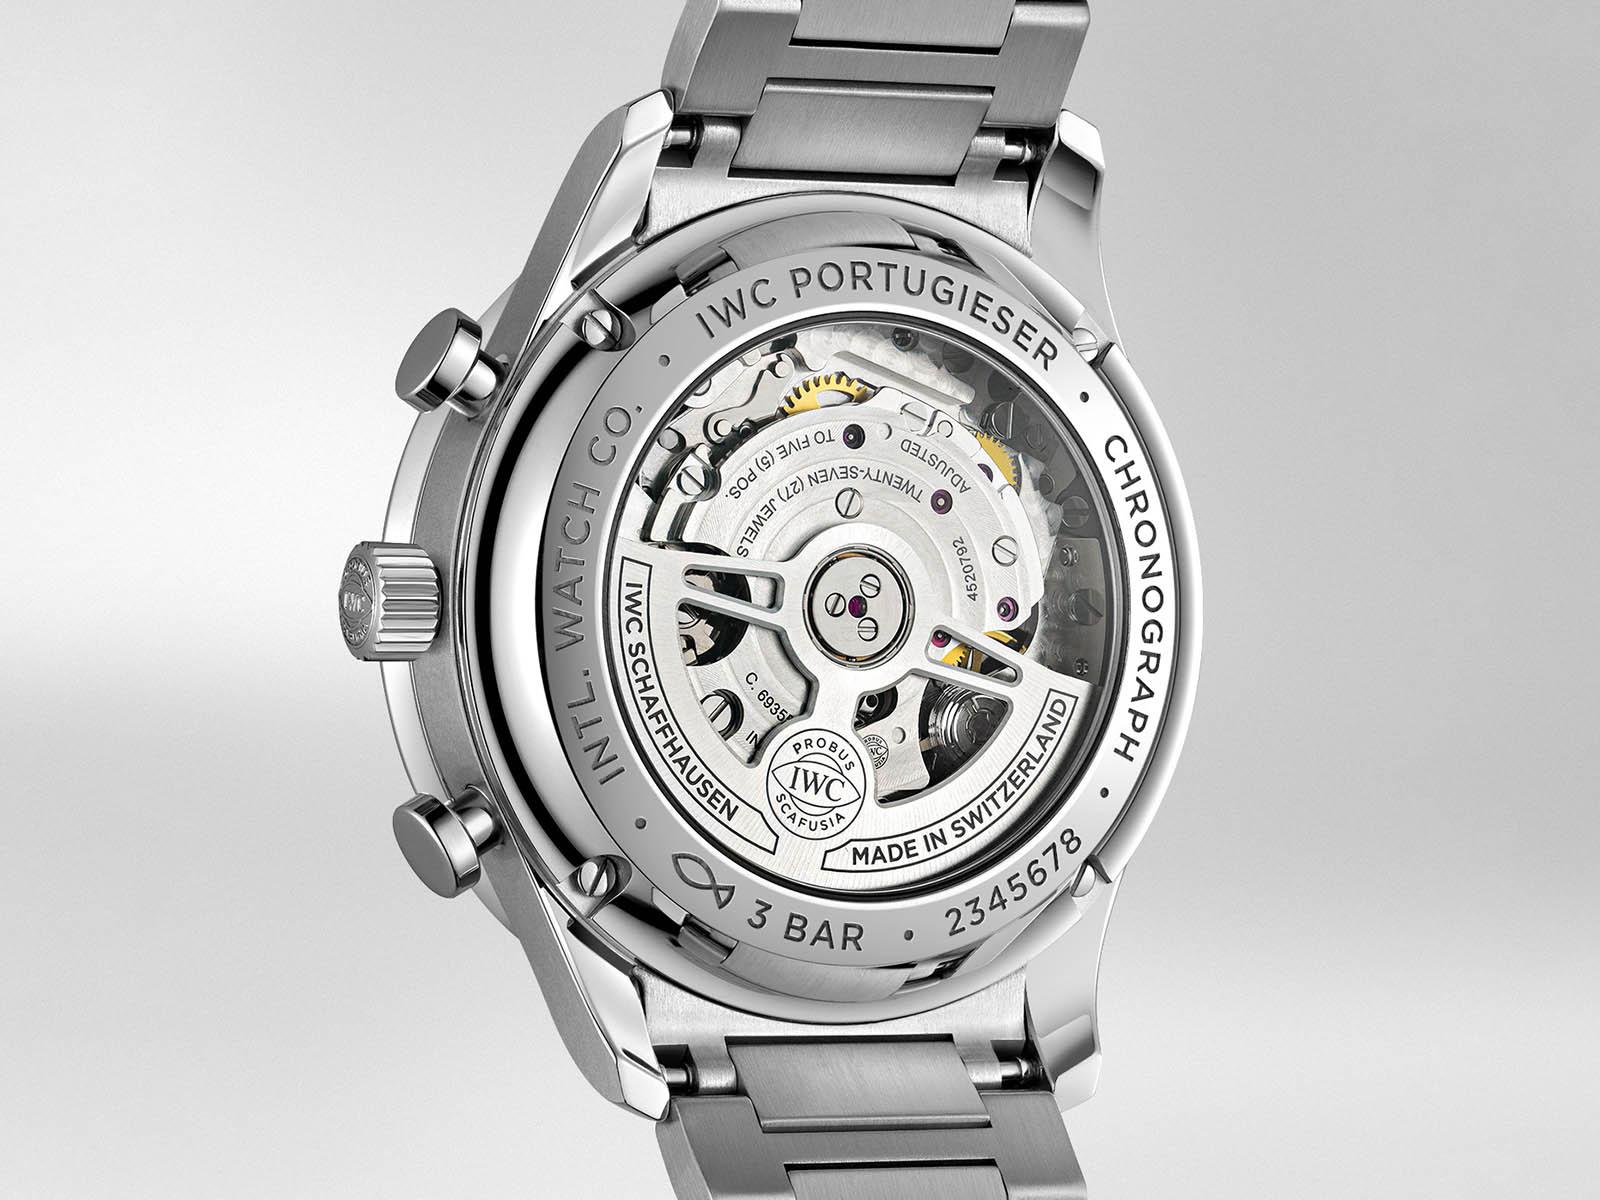 iw371617-iwc-portugieser-chronograph-stainless-steel-bracelet-6.jpg